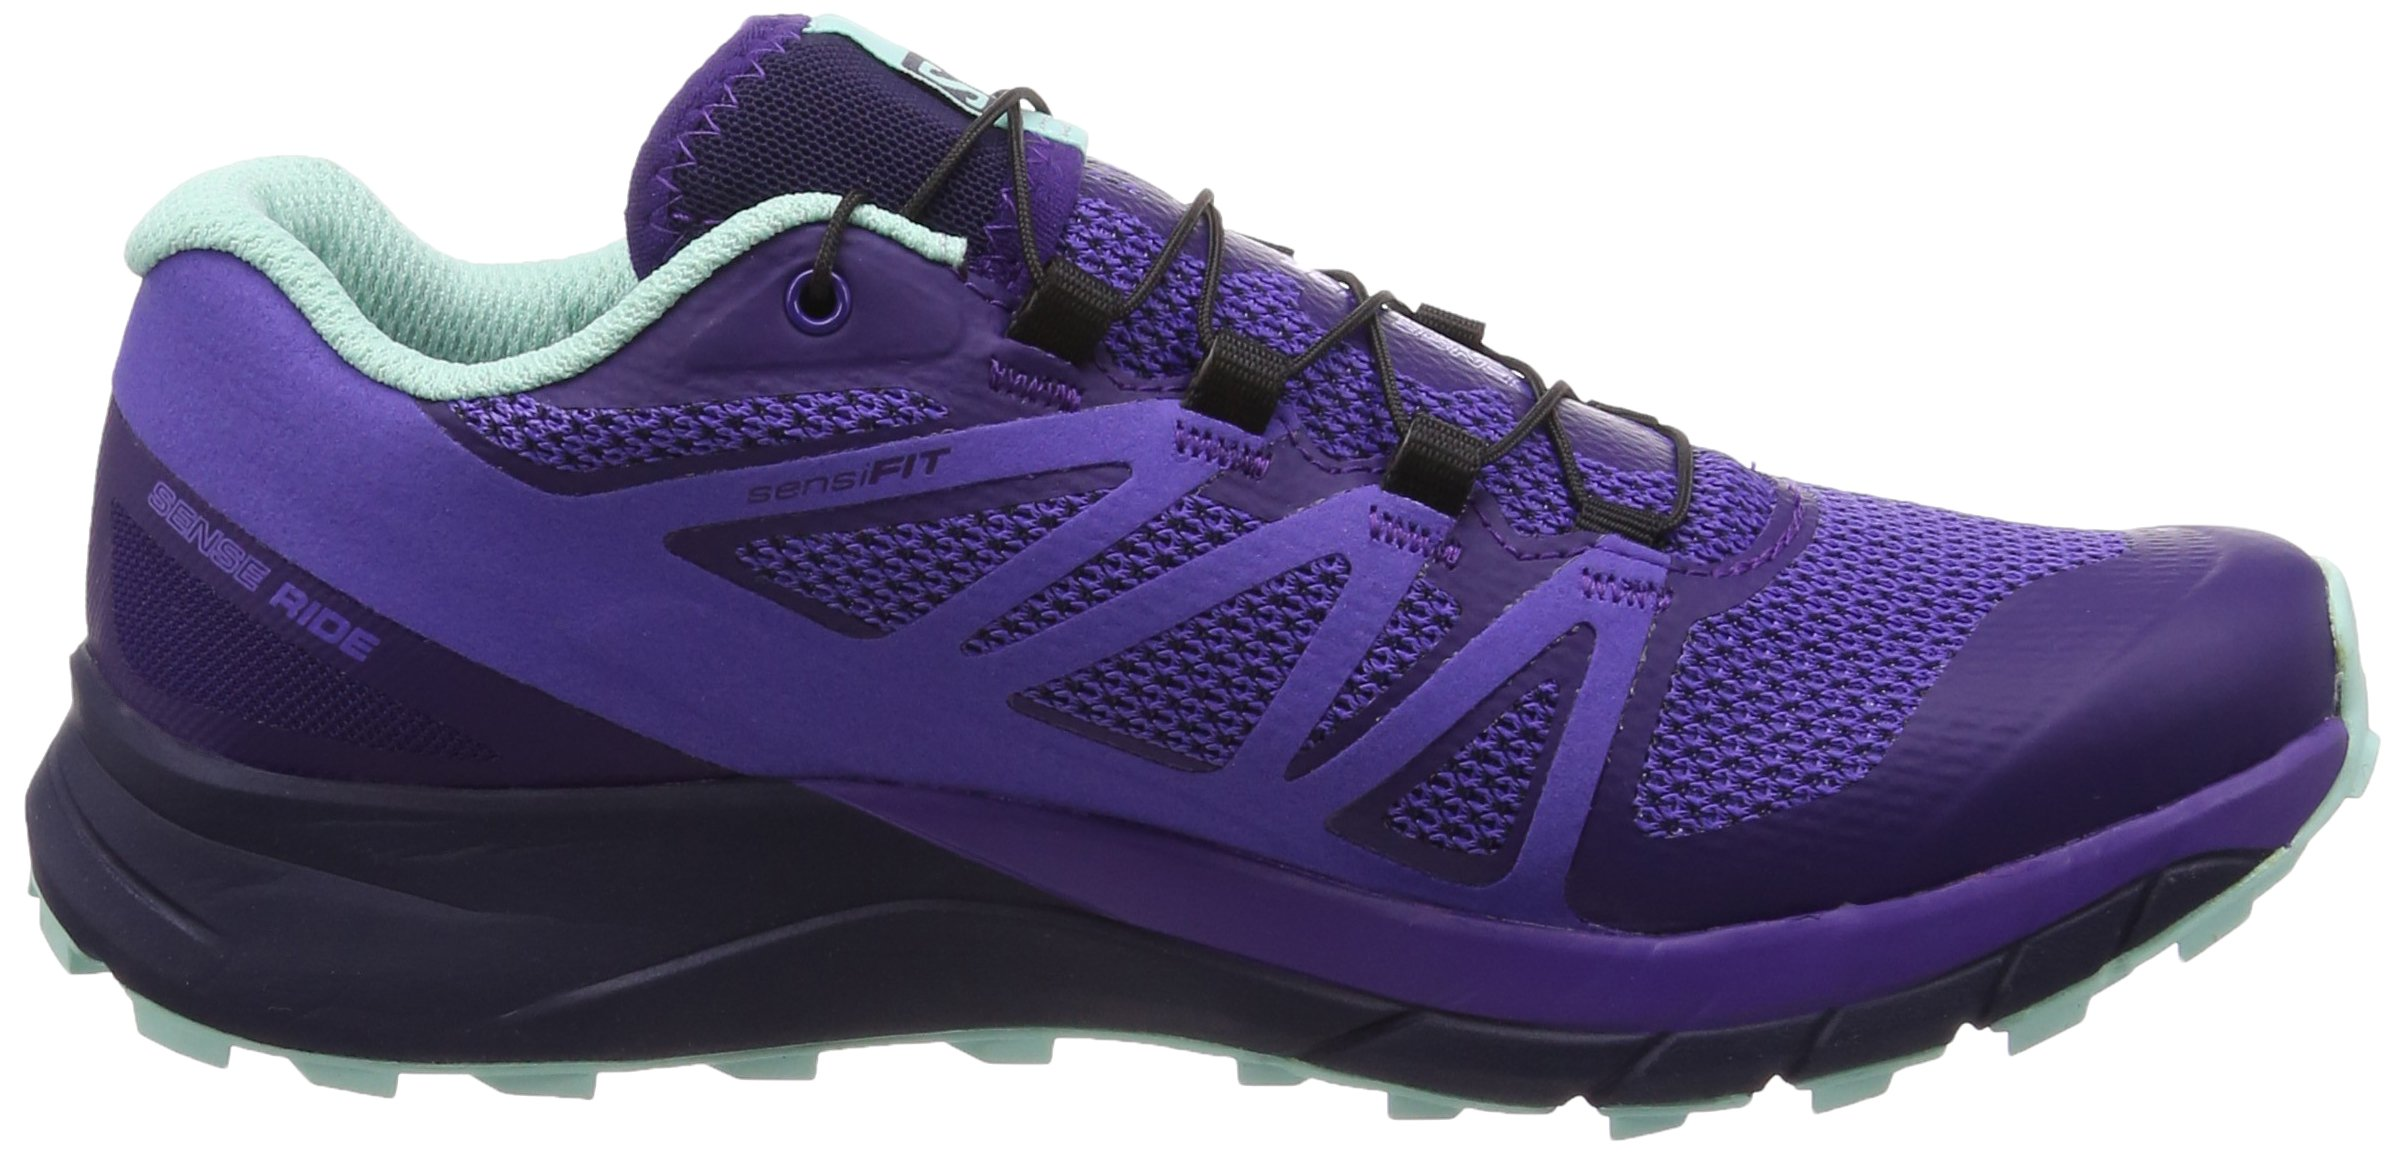 Salomon Women's Sense Ride Running Shoes, Purple, 6.5 M by Salomon (Image #6)